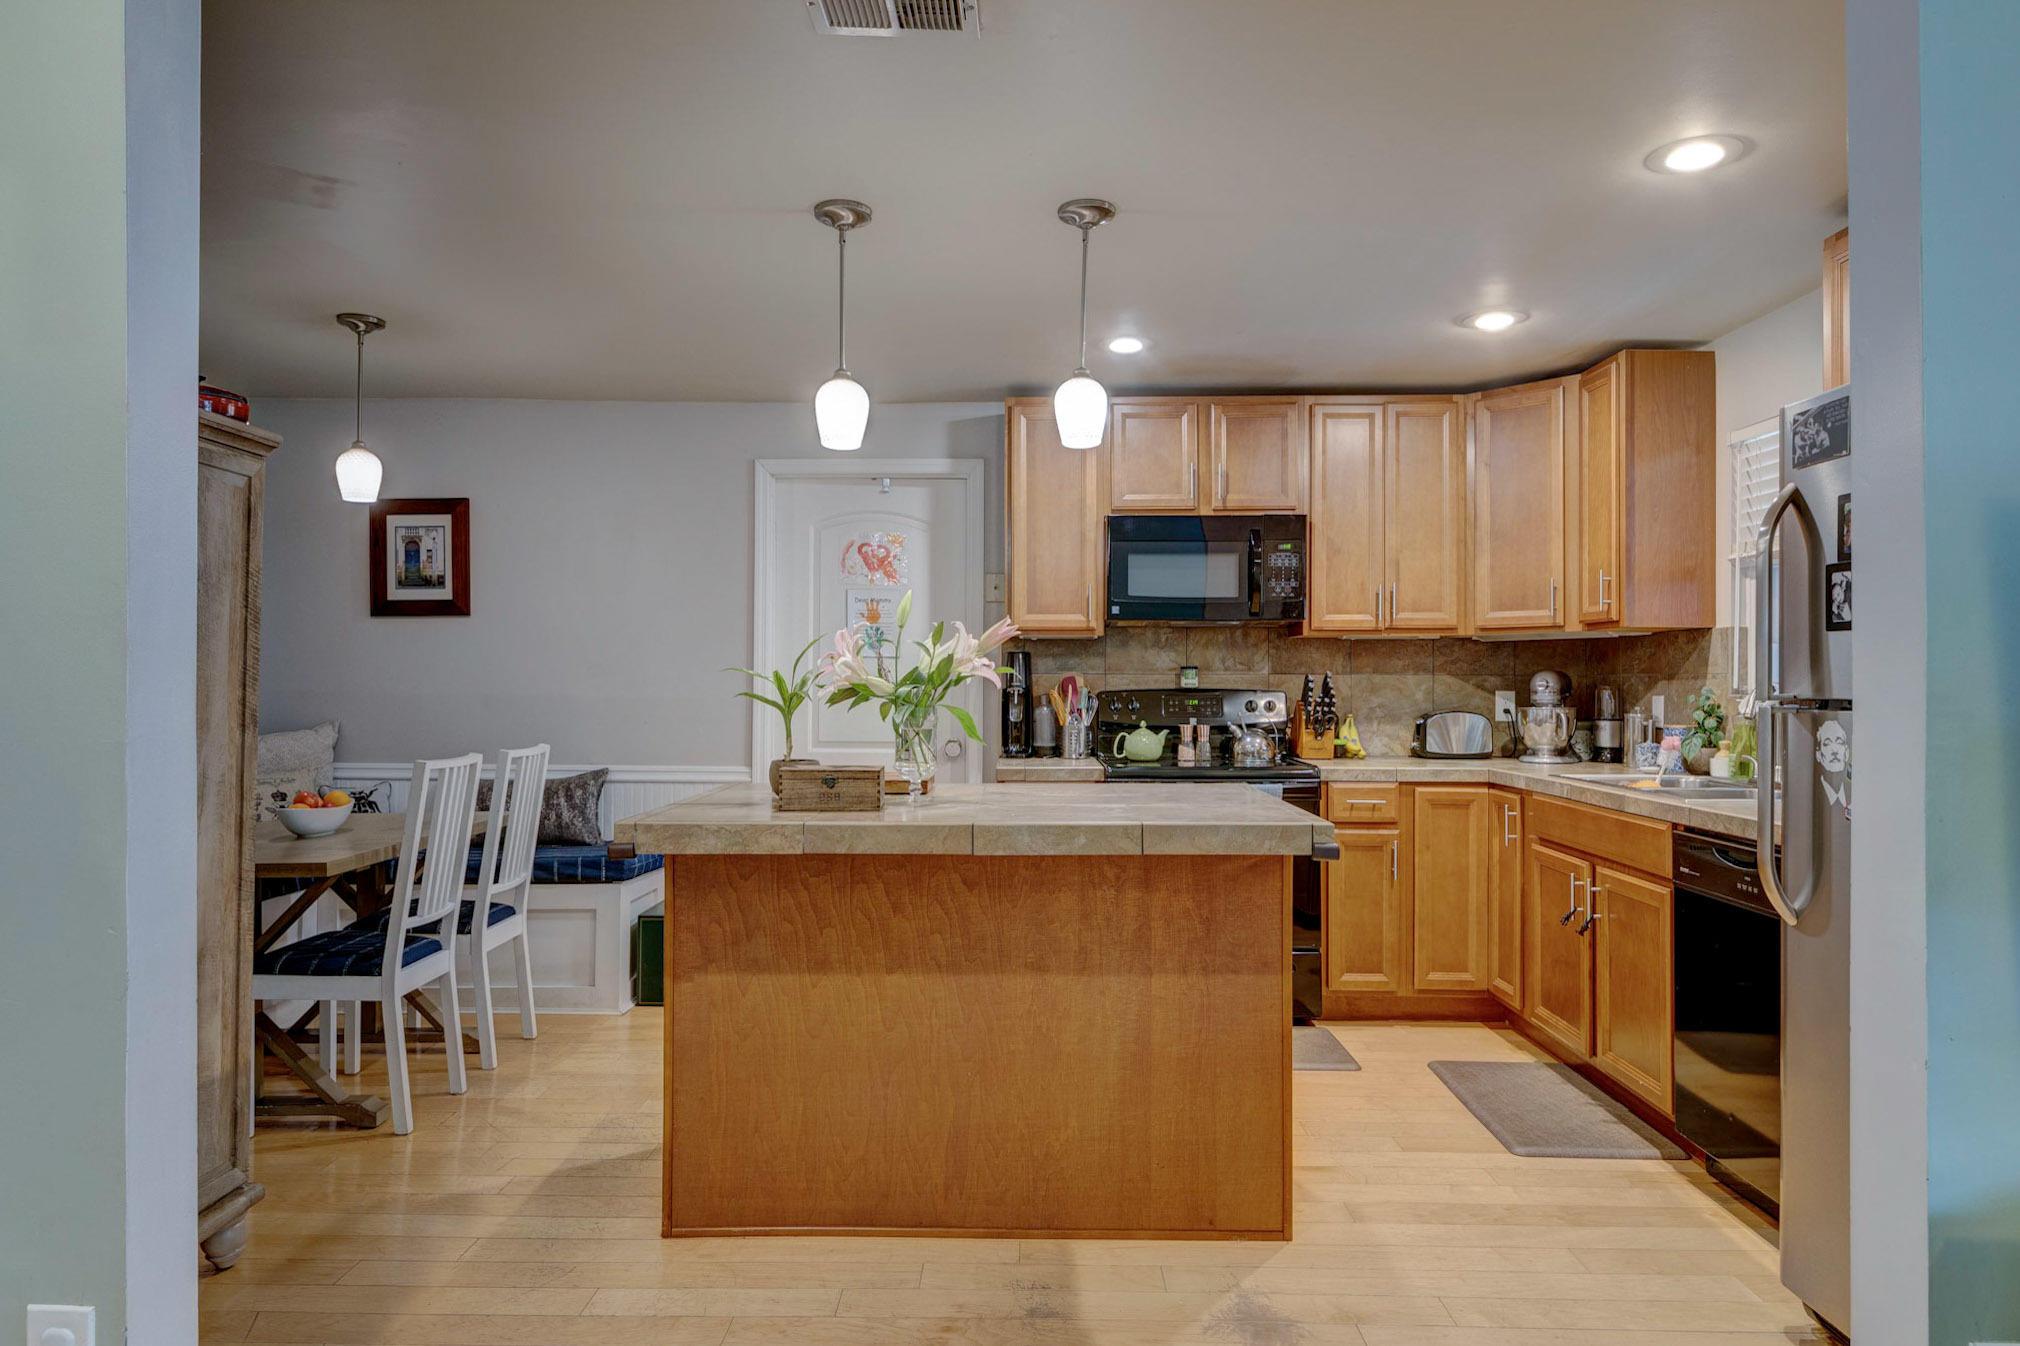 St Andrews Homes For Sale - 1808 2nd, Charleston, SC - 5